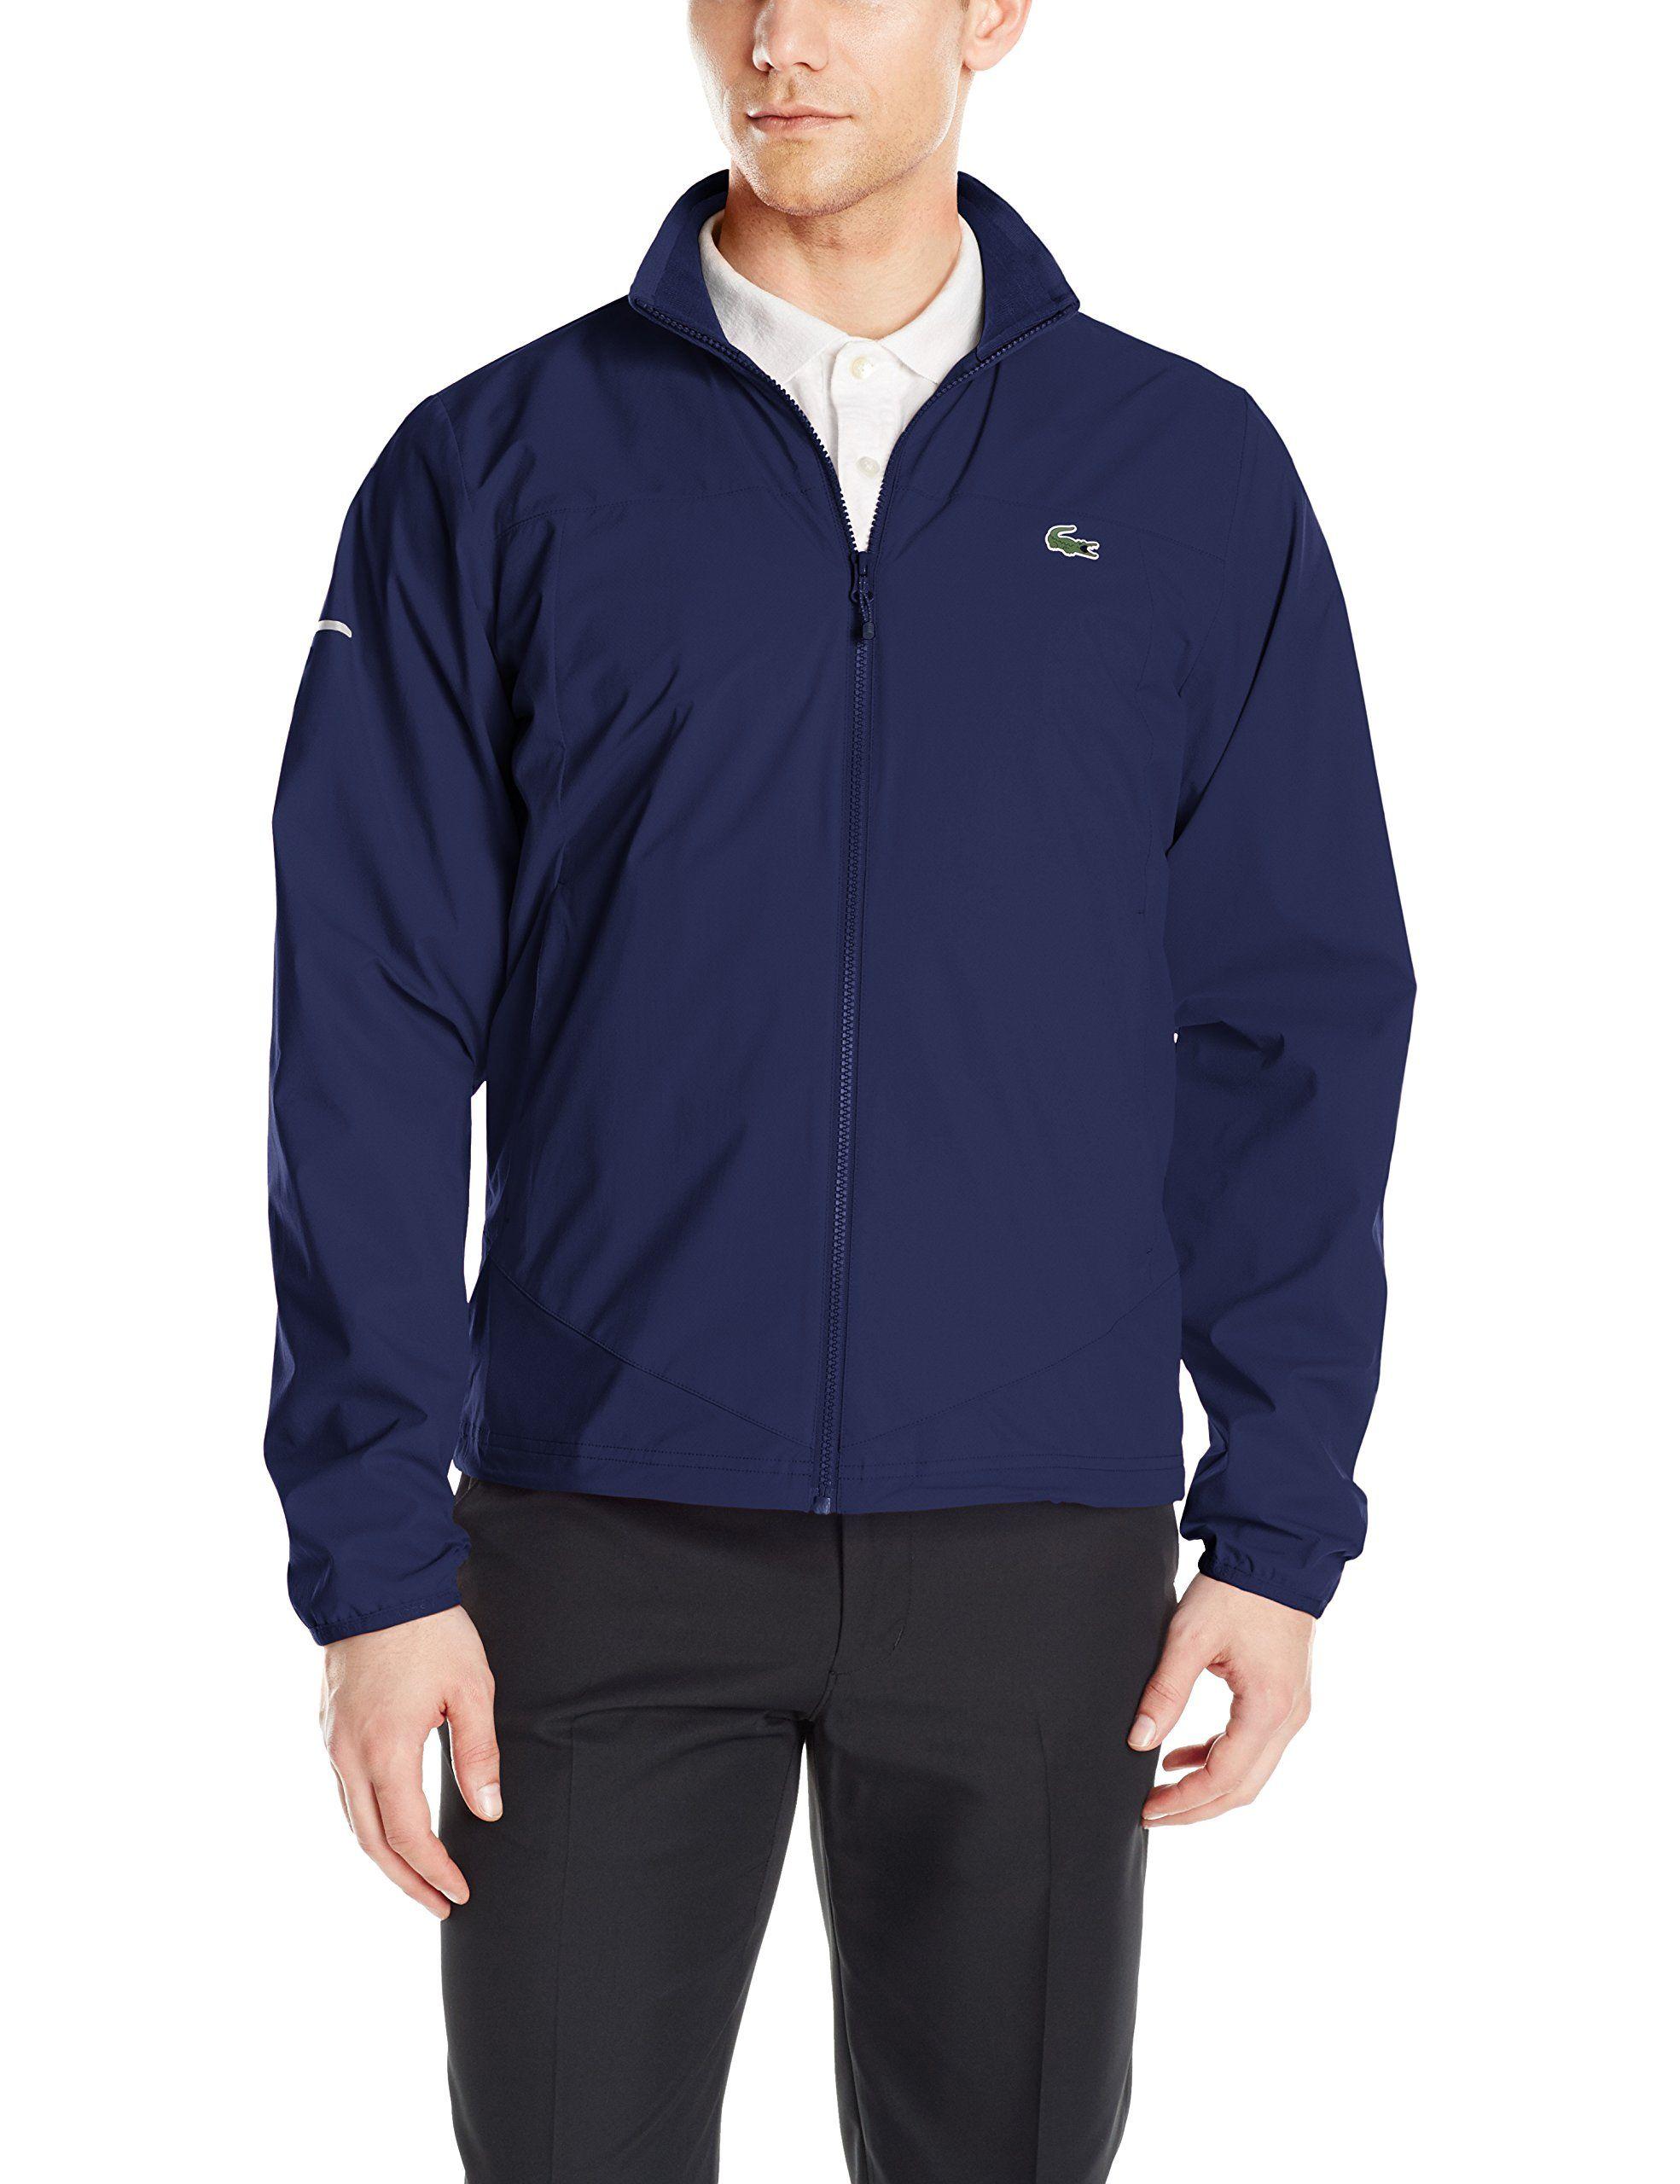 f4f40539 Men Golf Clothing - Lacoste Mens Golf Taffeta Jacket BH213251 Navy Blue/Navy  BlueWhite Large